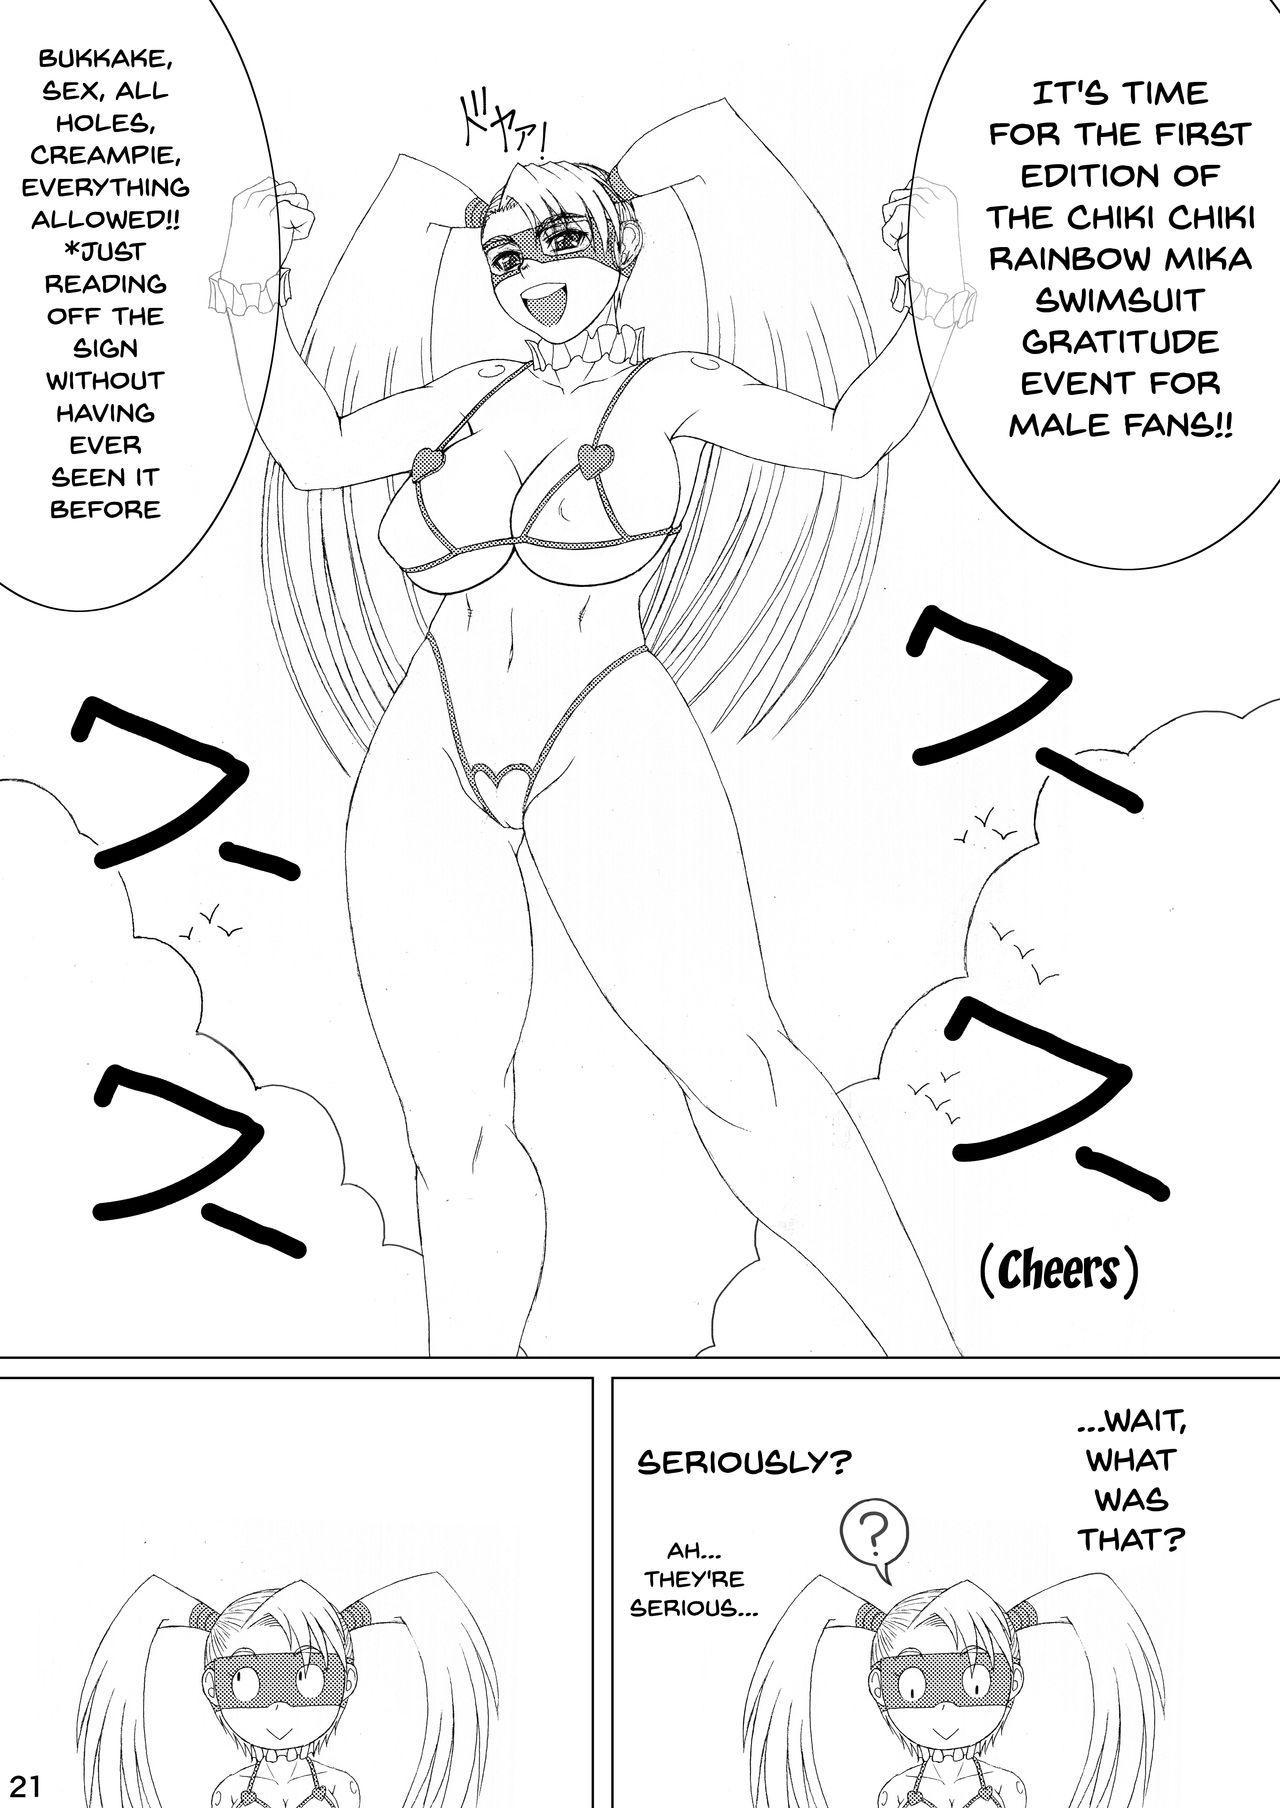 [POWERPLAY (Various)] CAPCOM (& MORE!) VS FIGHTING GIRLS Swimsuit & Gangbang Special (Various) [English] {Doujins.com} [Digital] 17